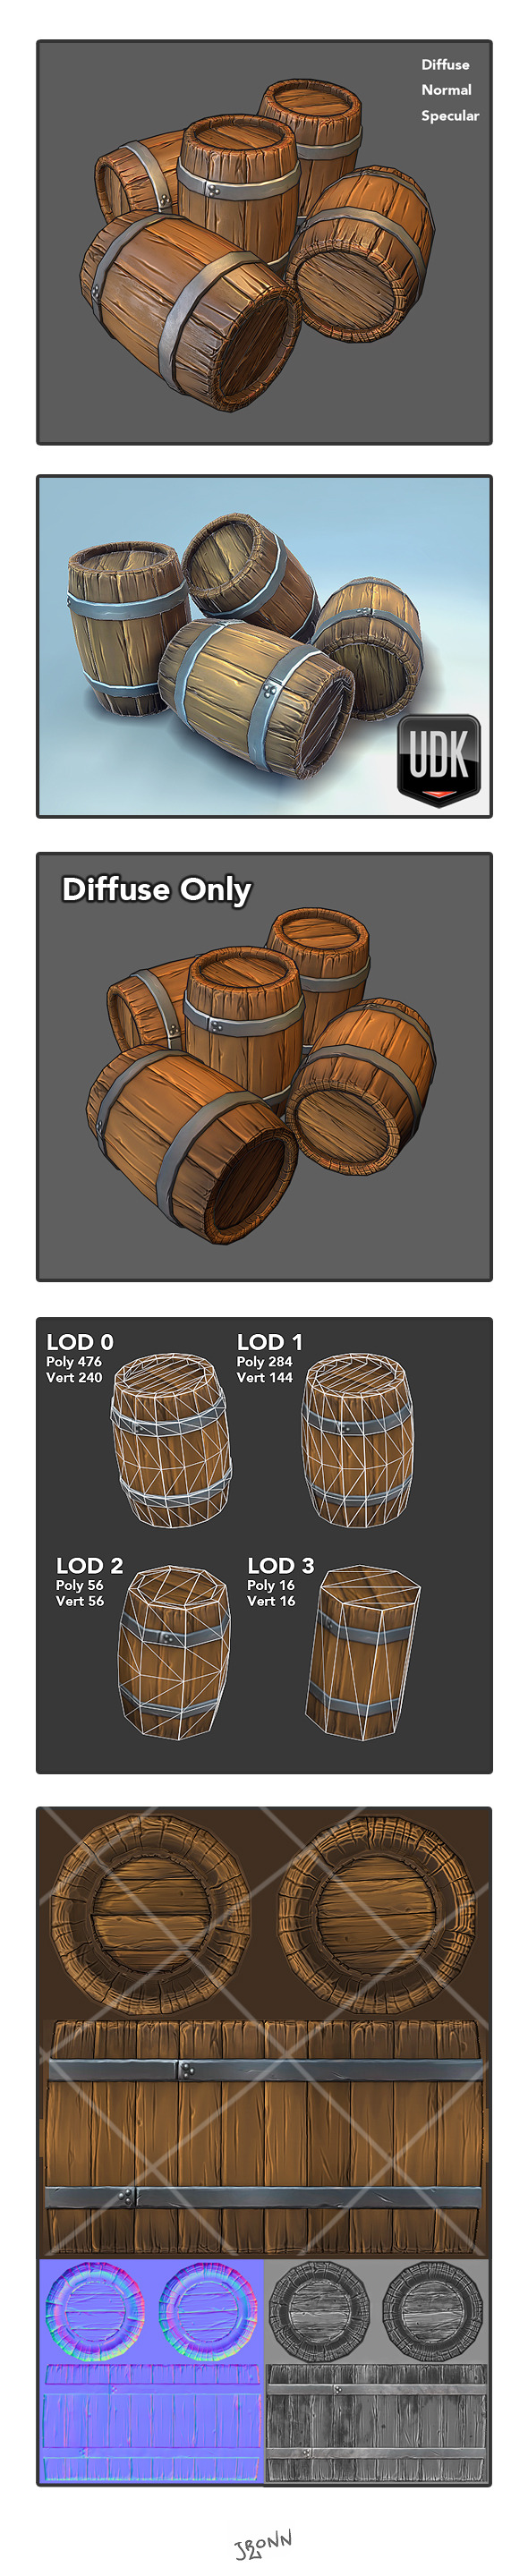 3DOcean Low Poly Wooden Barrel 4519152